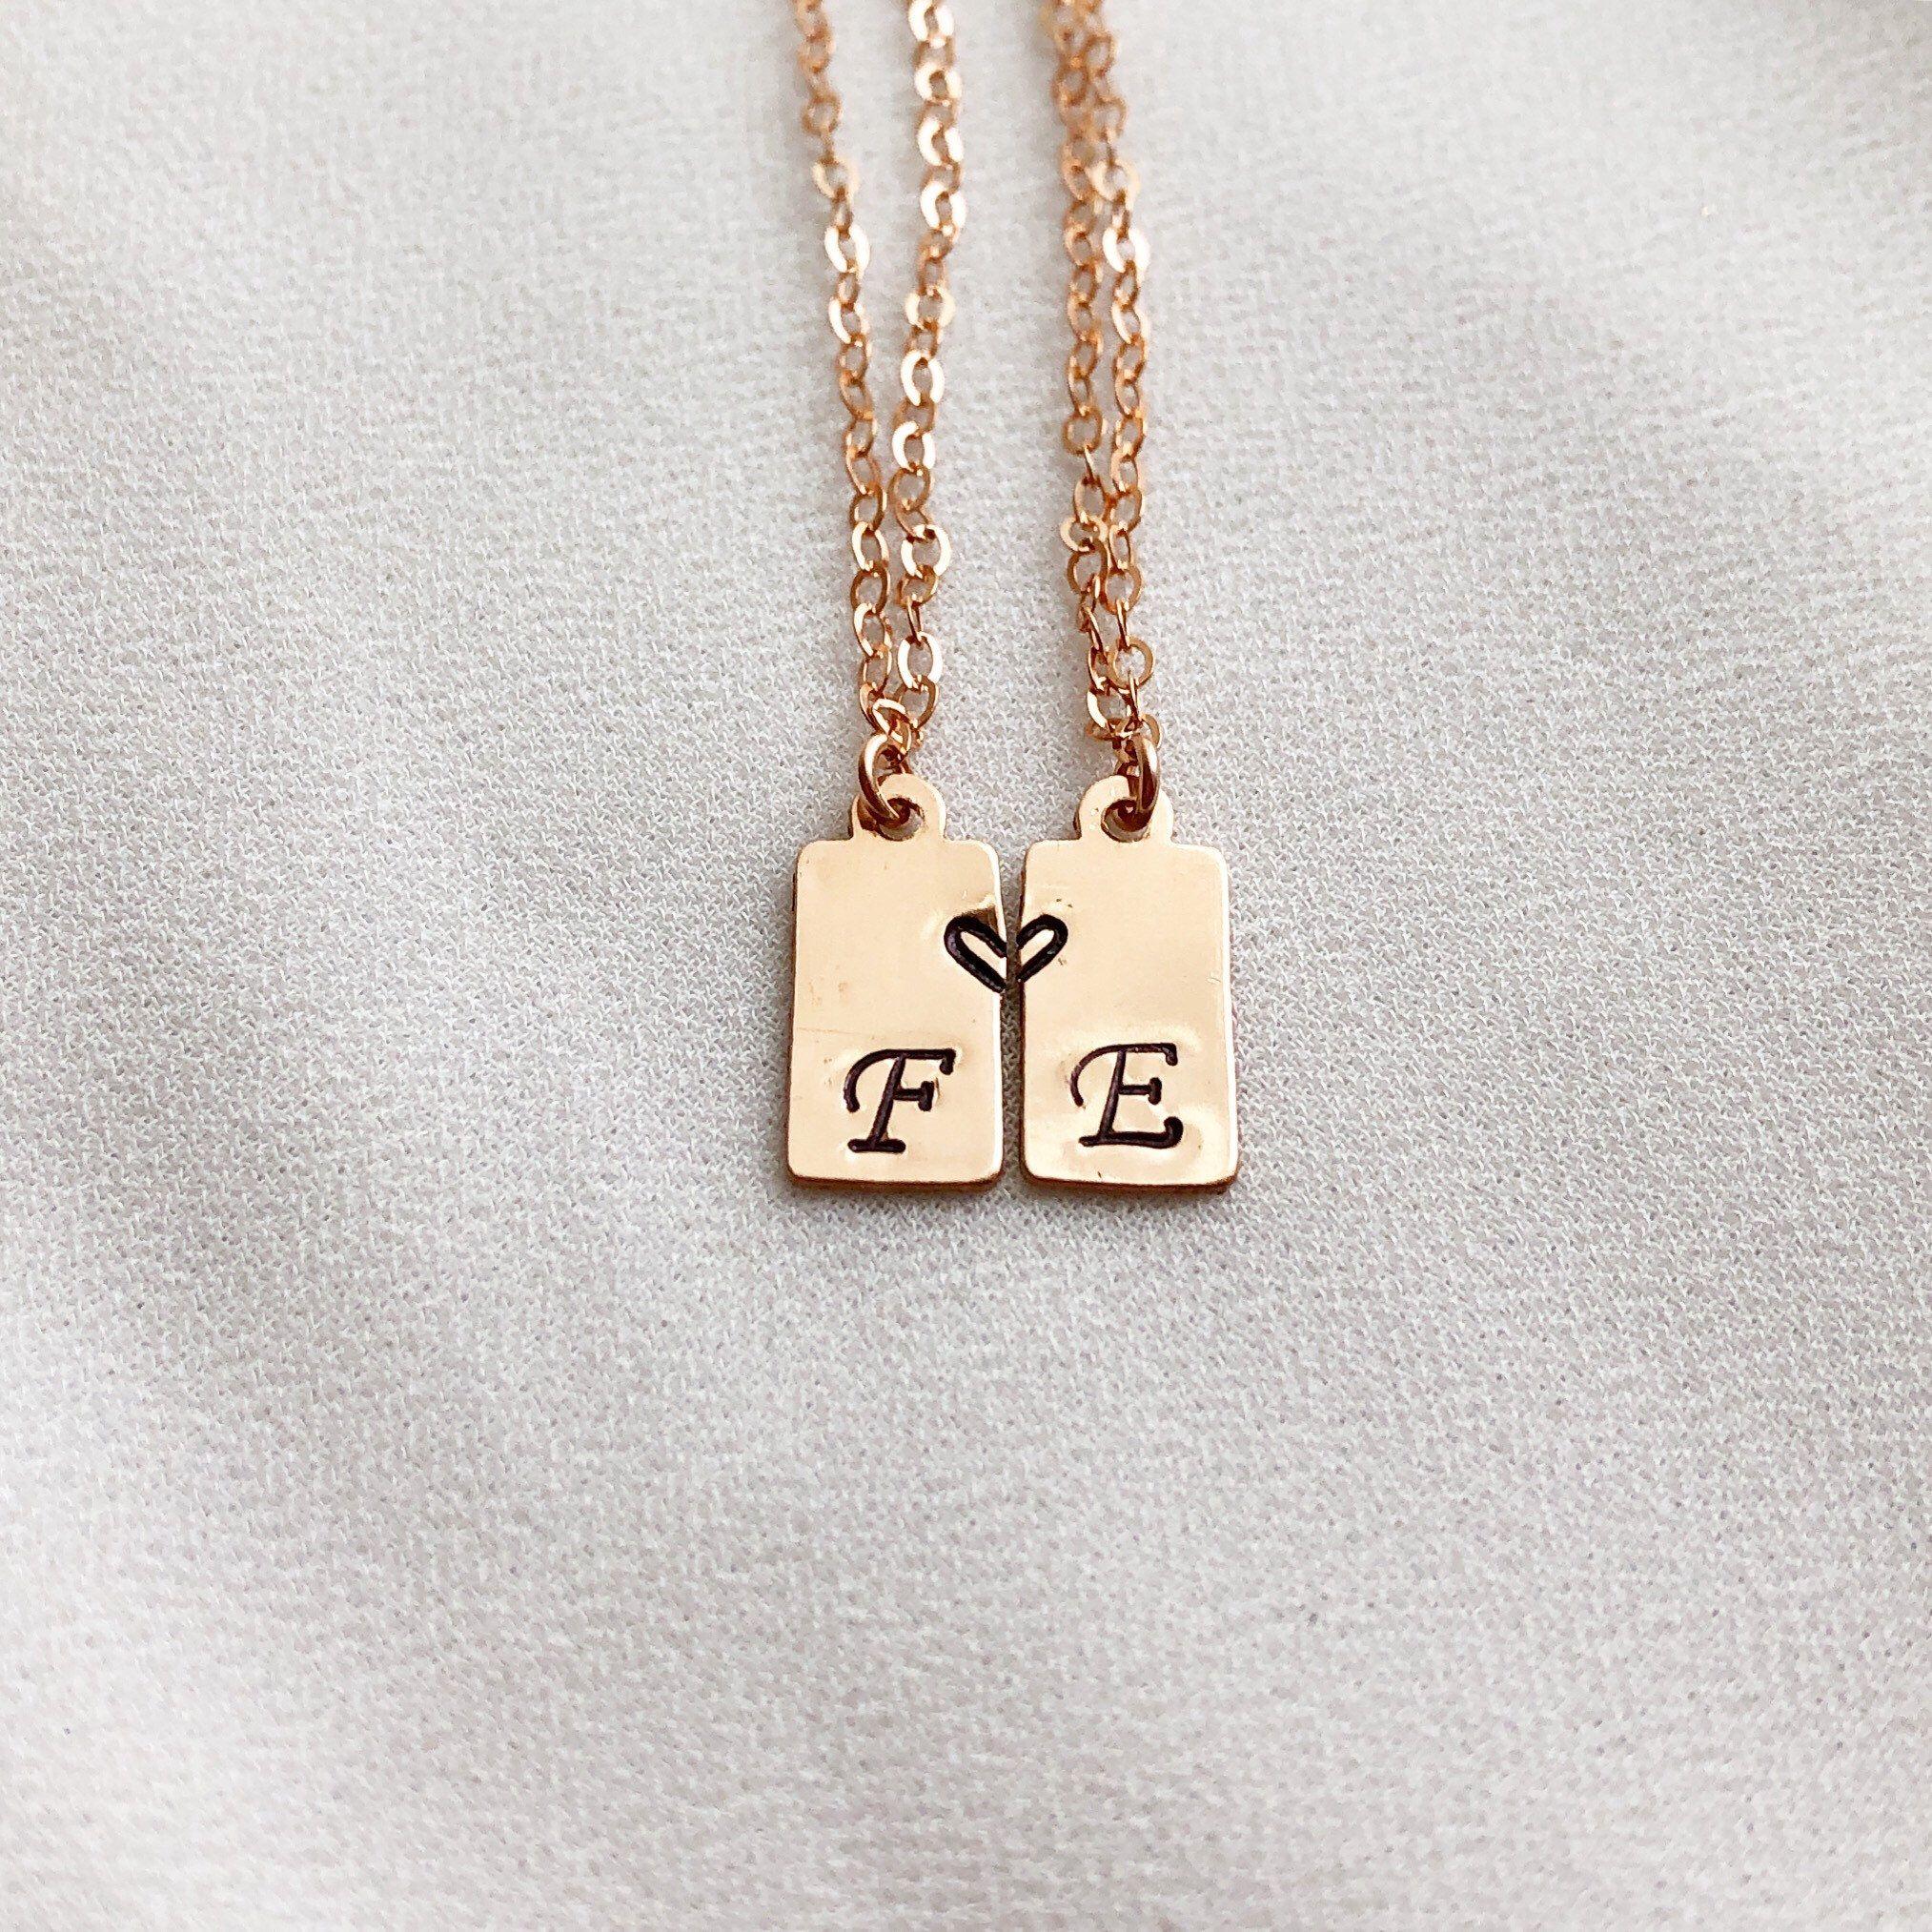 Personalized Friendship Necklace Set Best Friend Necklace For Etsy Best Friend Necklaces Friend Necklaces Friendship Necklaces